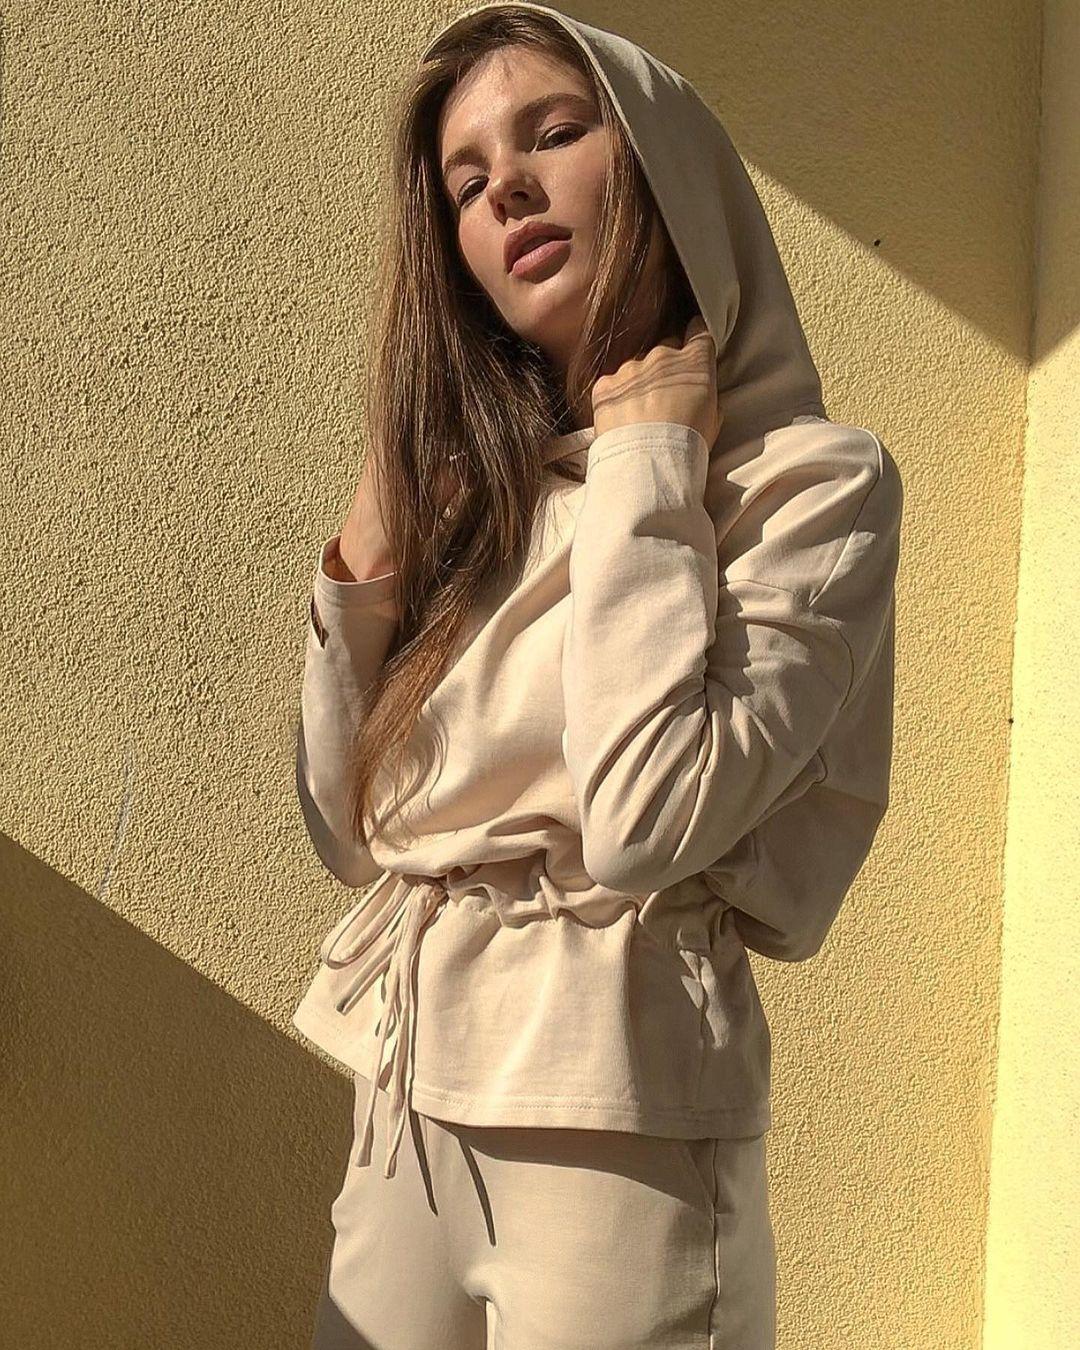 Anna-Kudinova-Wallpapers-Insta-Fit-Bio-2